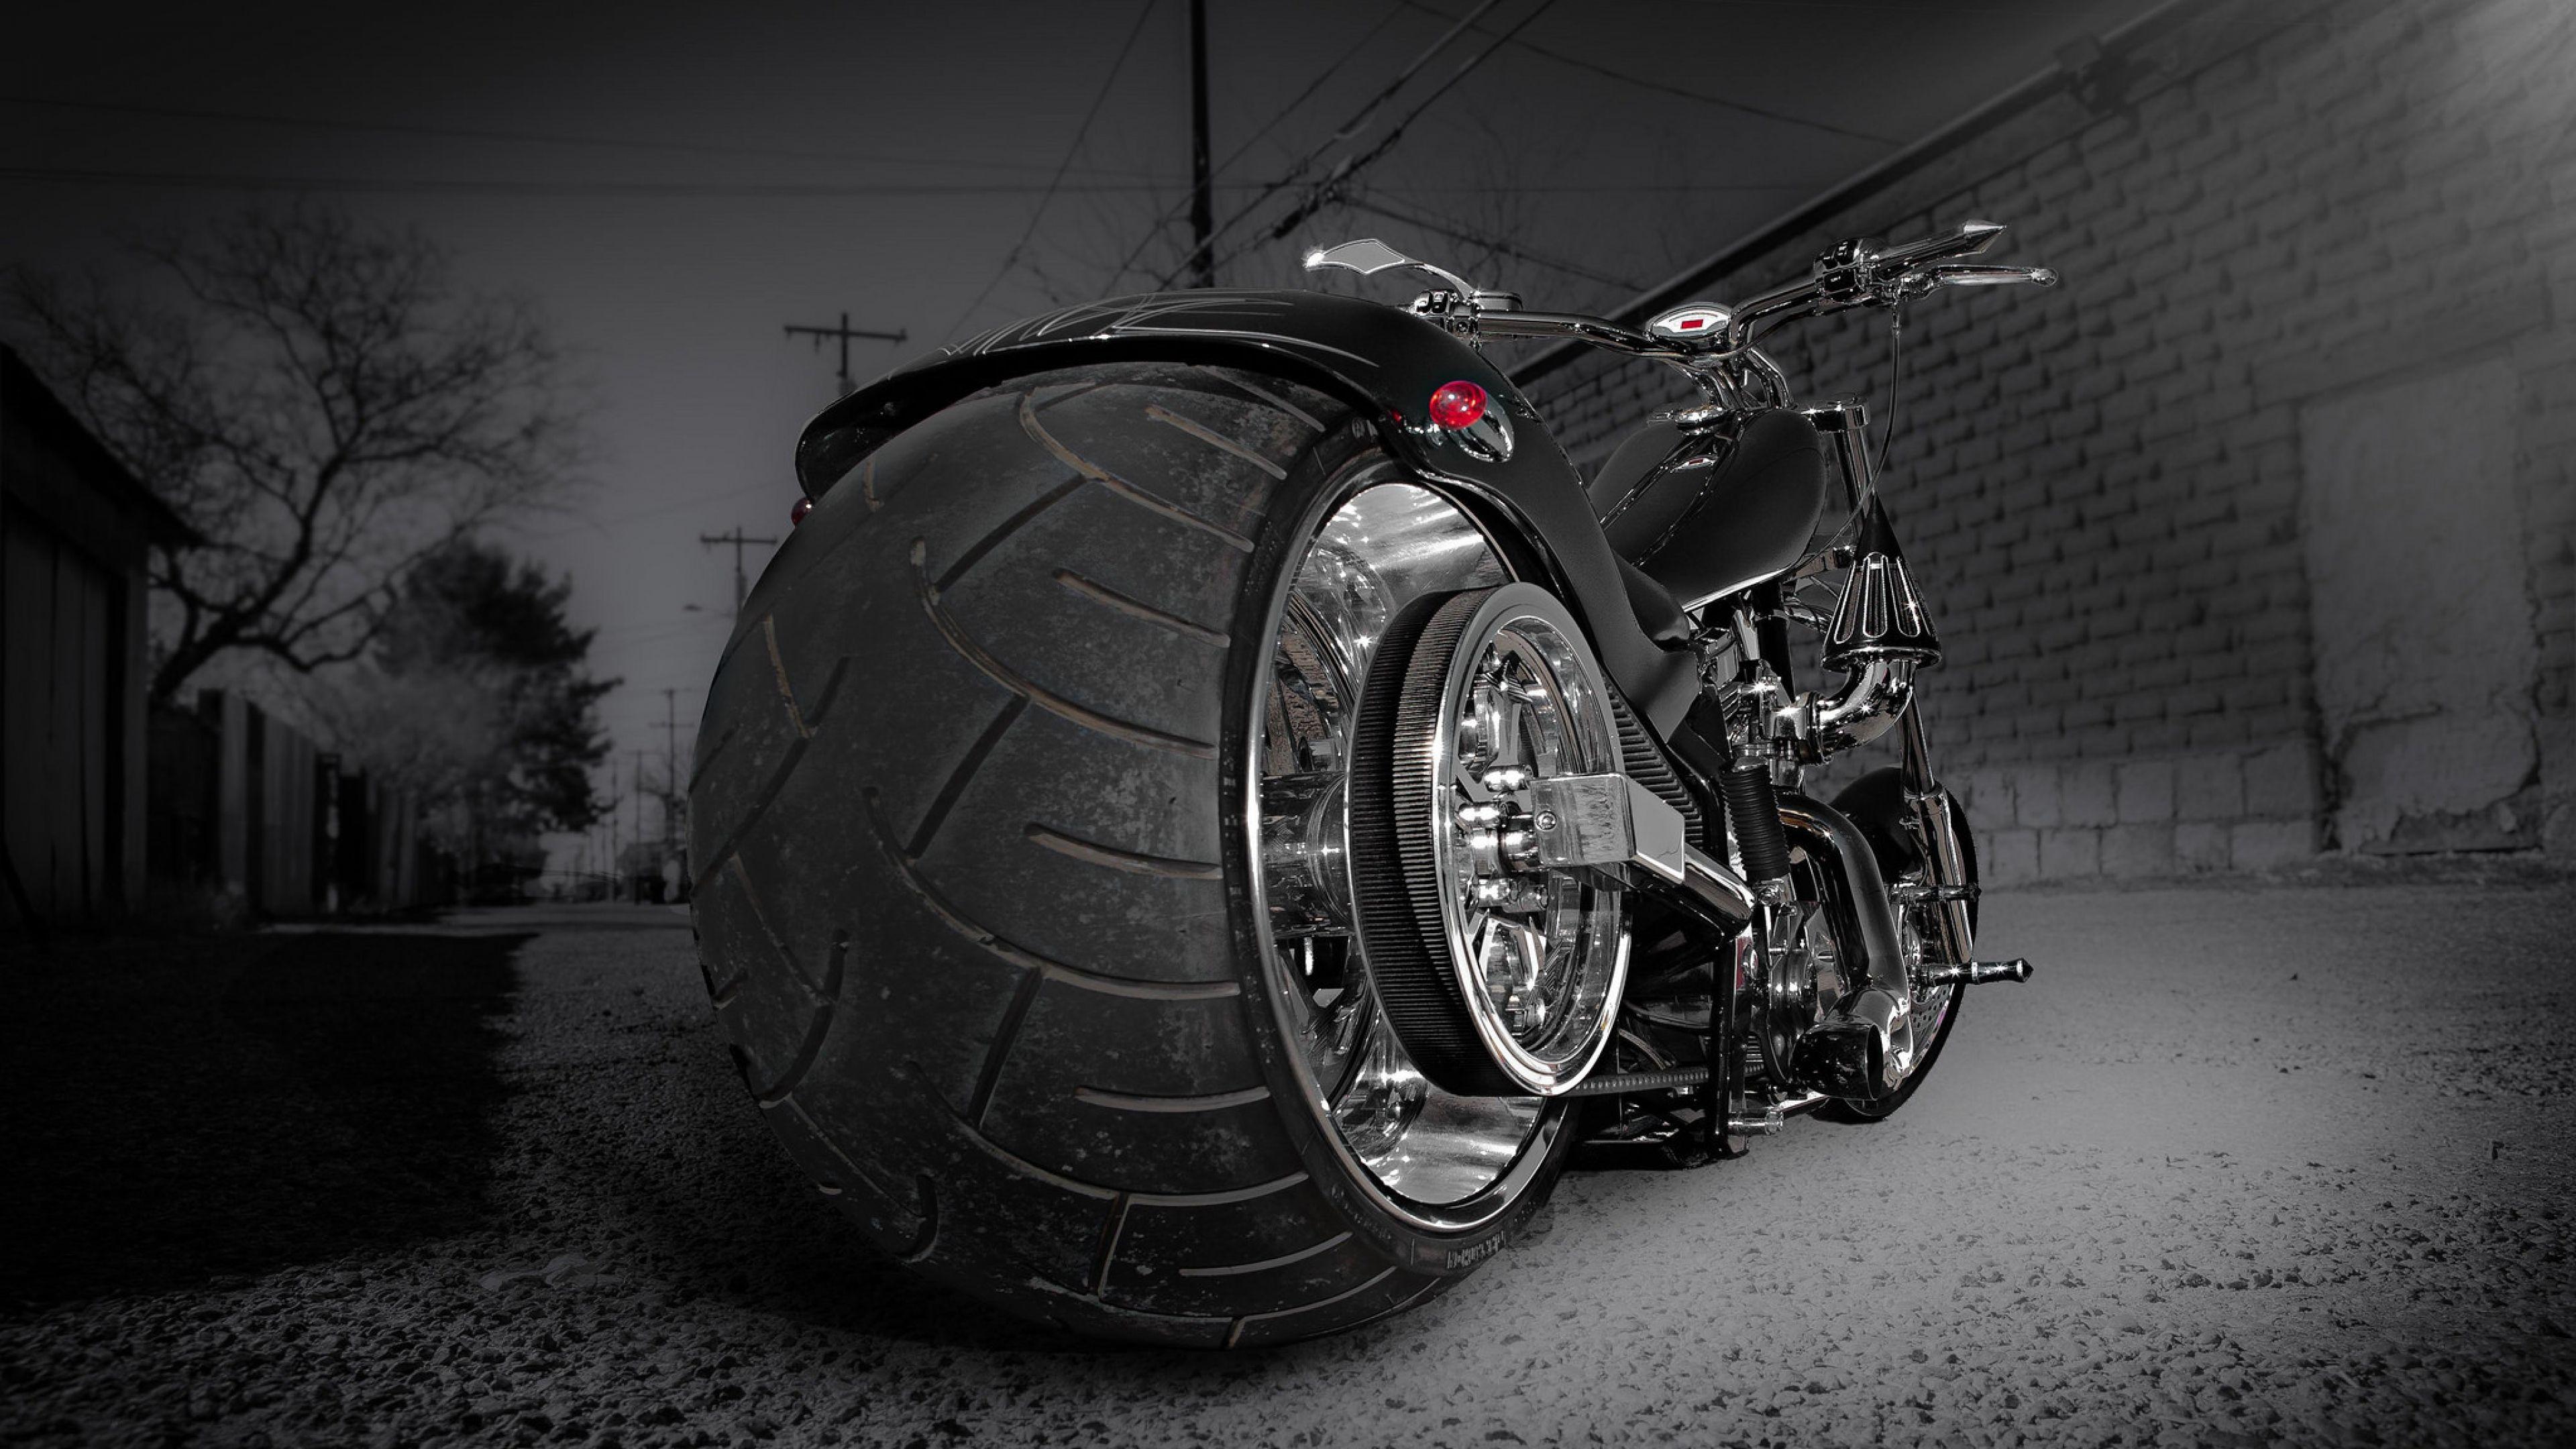 3840x2160 Wallpaper Motorcycle Bike Chopper Sports Style